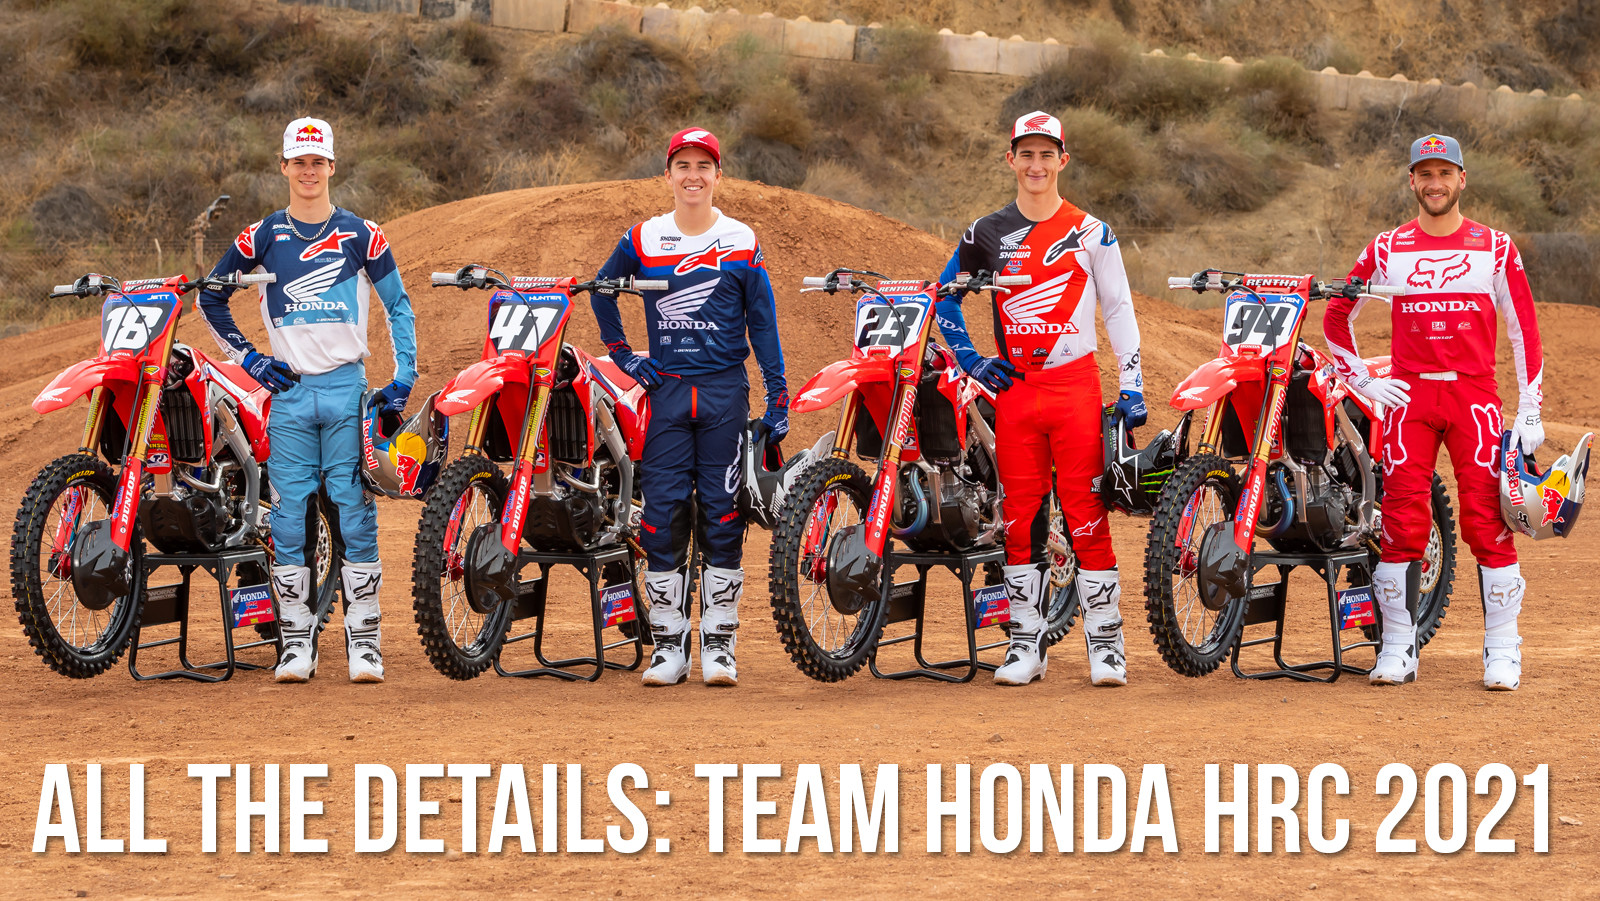 All The Details: Team Honda HRC 2021